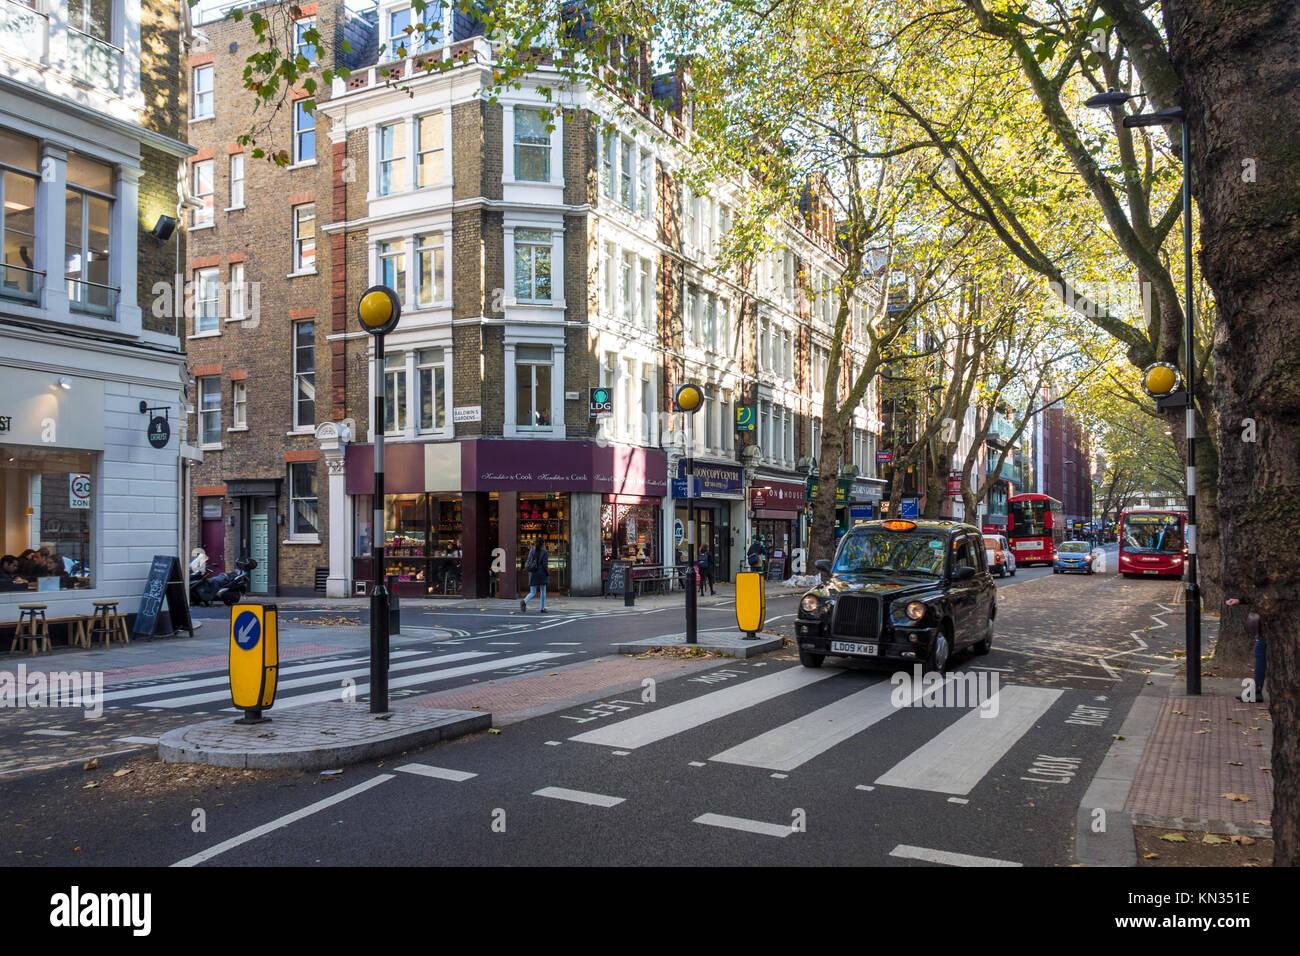 Londres taxi negro en un paso de peatones en Gray's Inn Road, Holborn, Londres Imagen De Stock